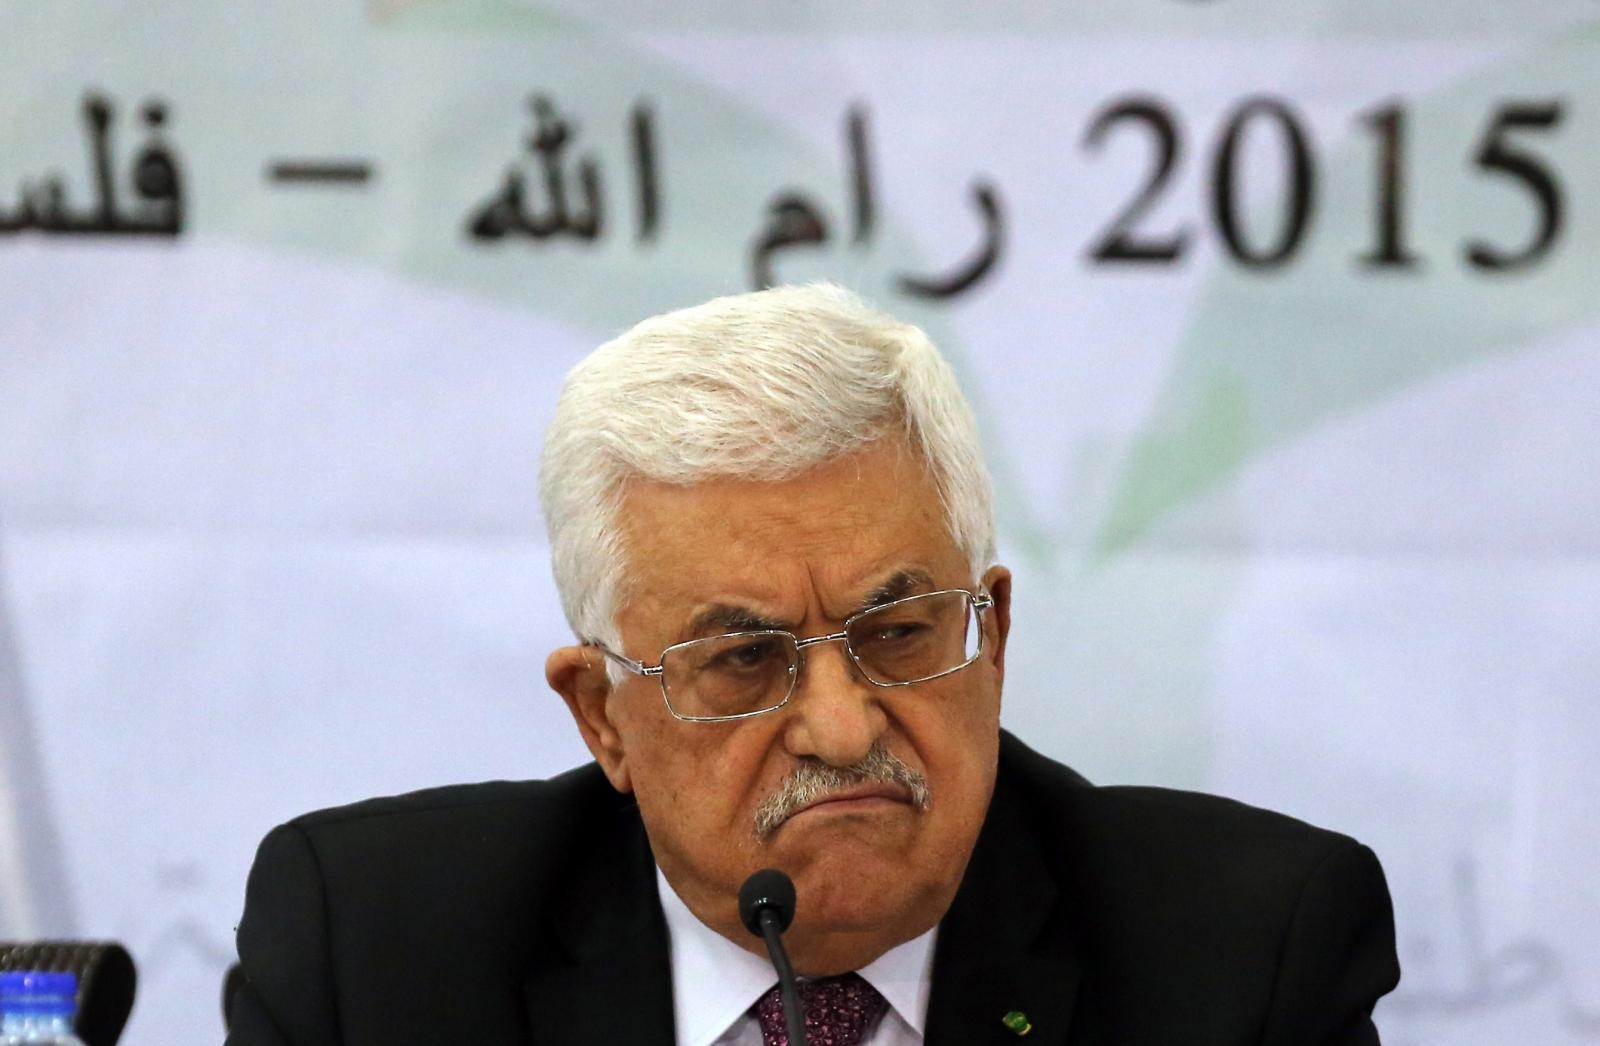 Palestinian leader Mahmud Abbas